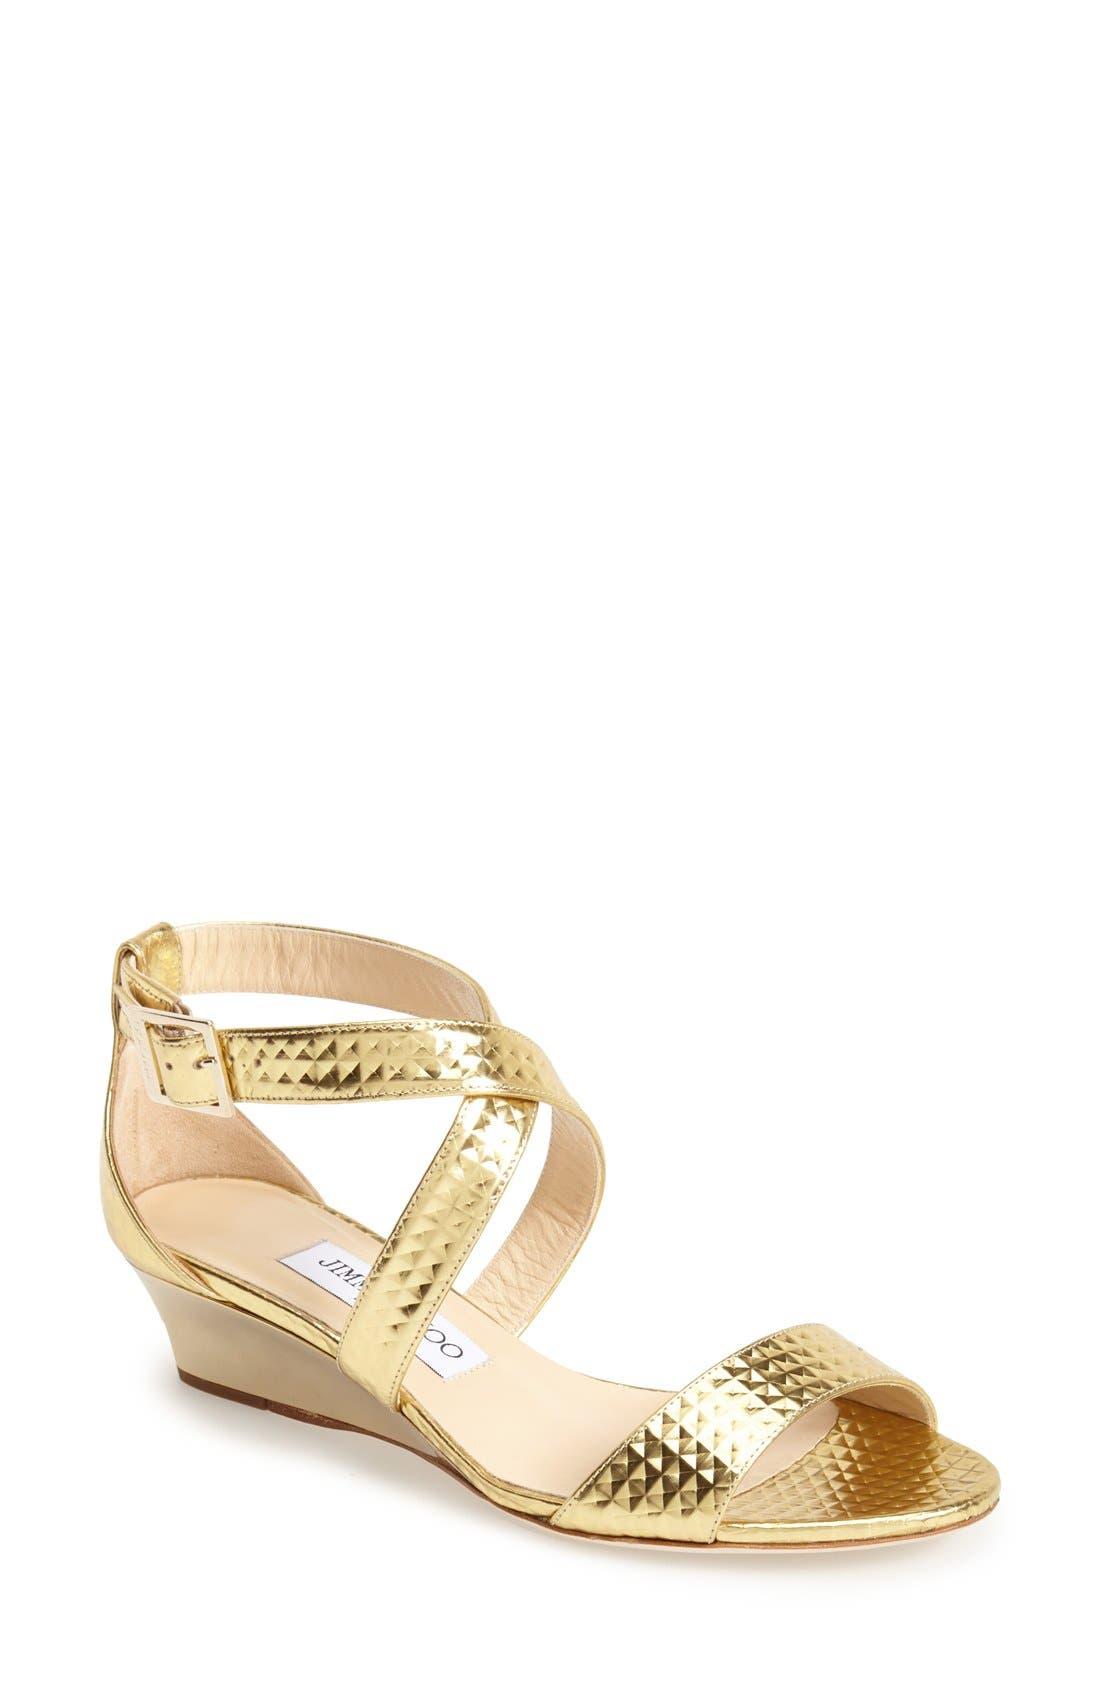 Alternate Image 1 Selected - Jimmy Choo 'Chiara' Leather Sandal (Women)